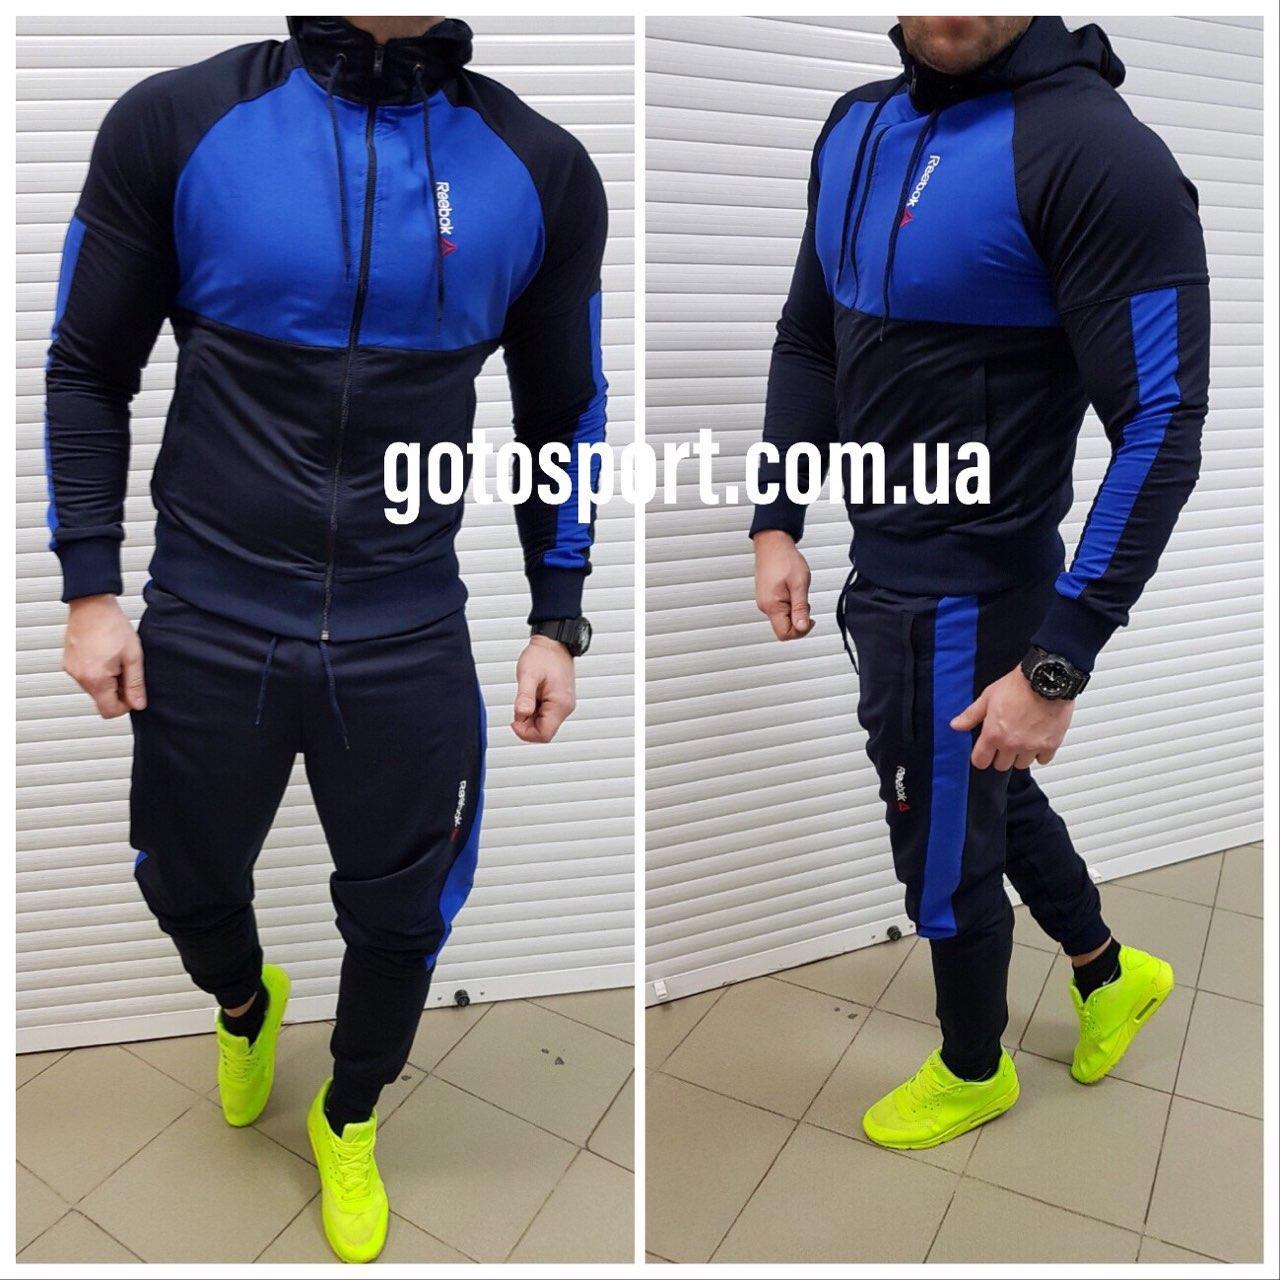 Мужской спортивный костюм Reebok Hercules синий